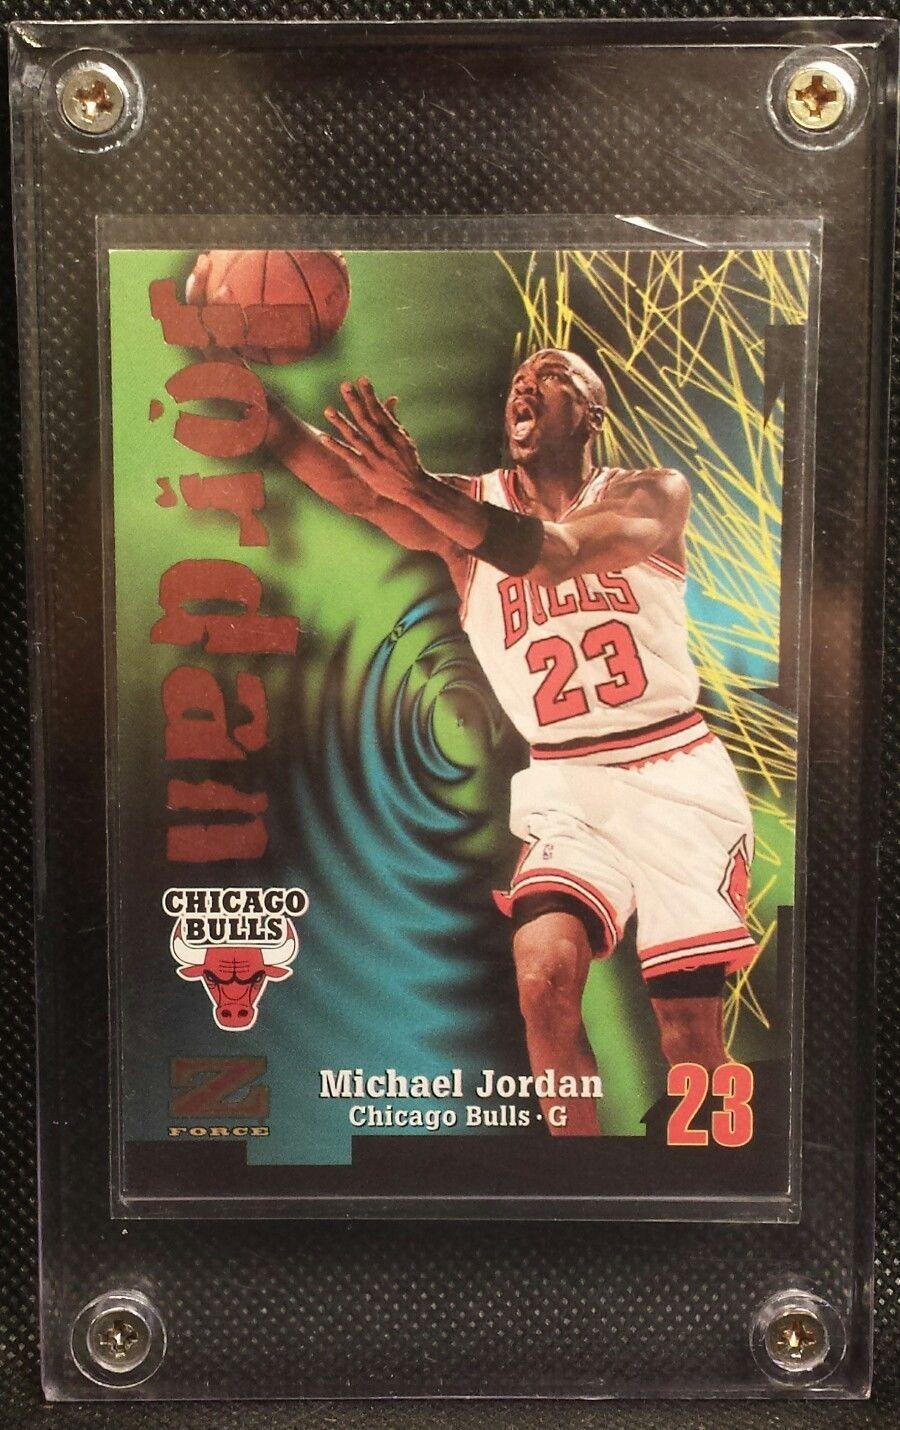 1997 skybox z force michael jordan 23 trading card chicago